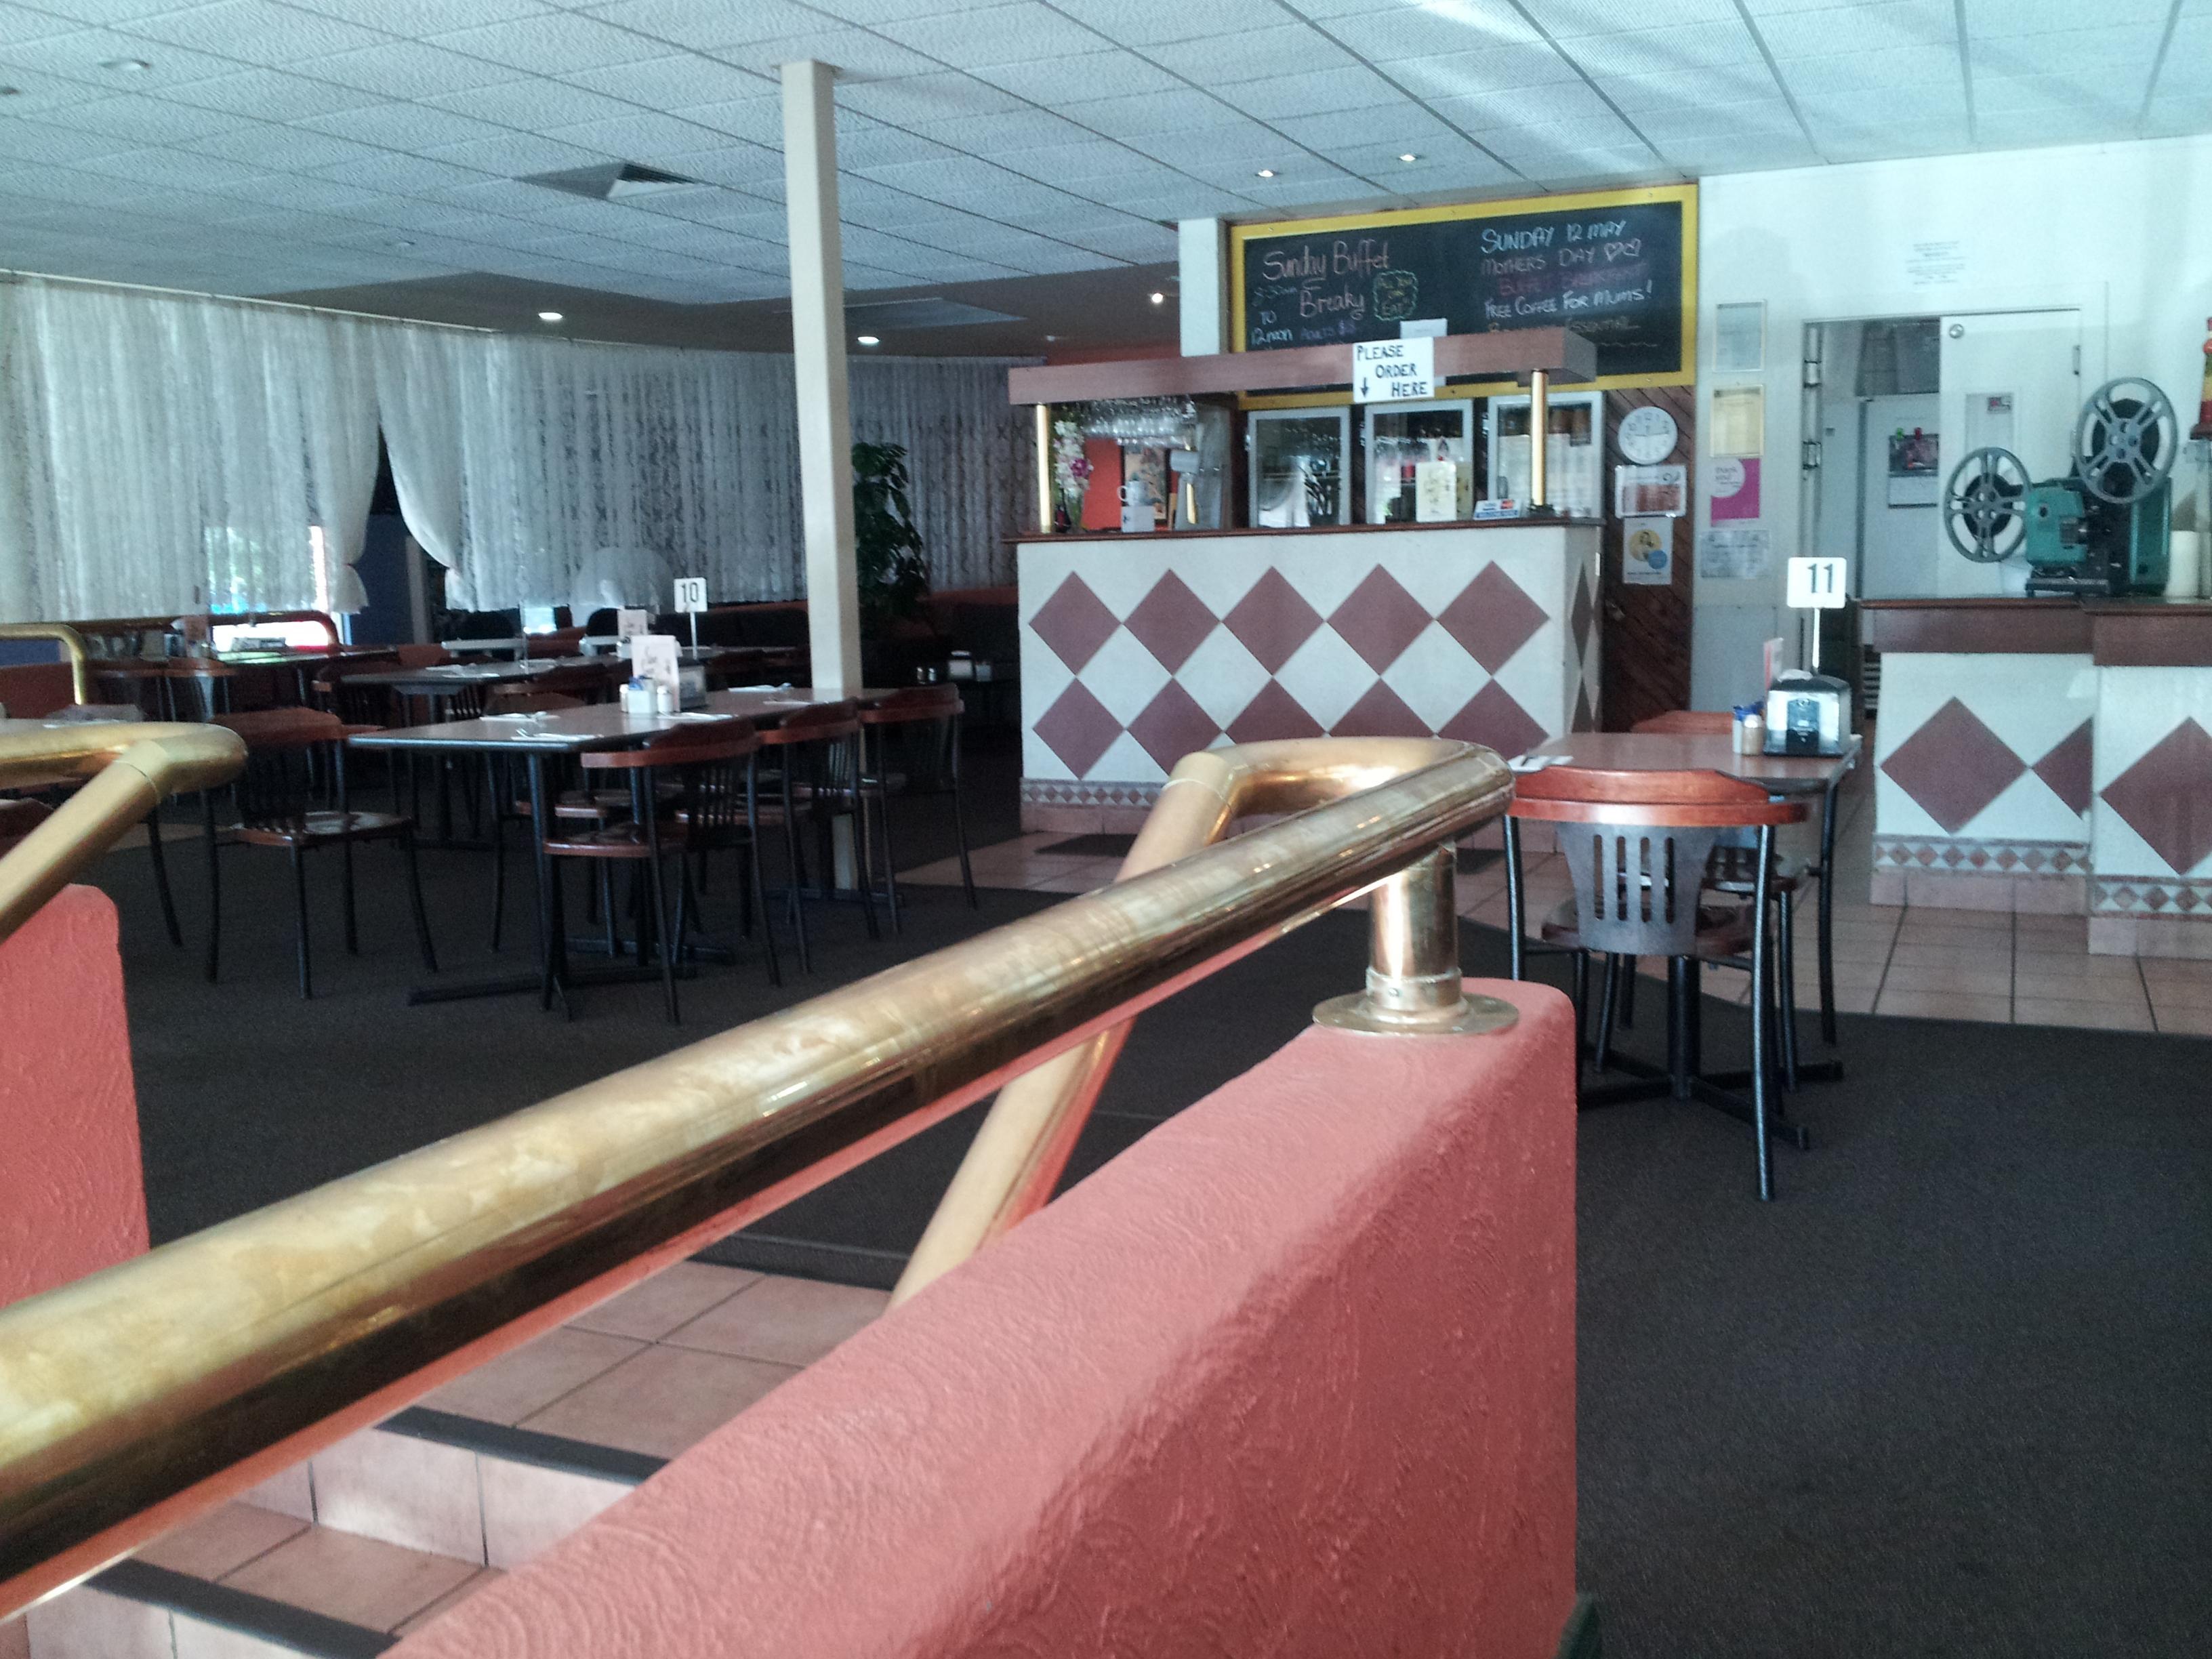 silver screen cafe, katherine - restaurant reviews & photos